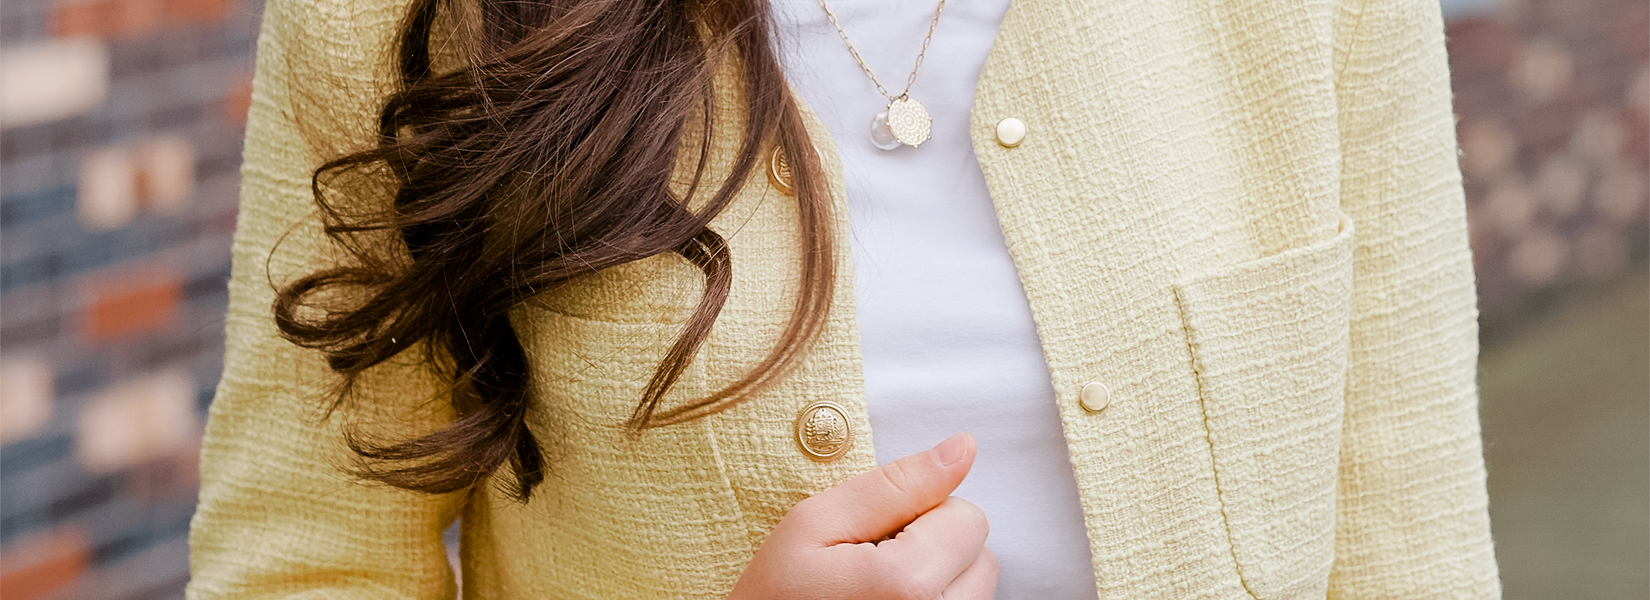 Yellow Bouclé Blazer:A Classic Fashion Piece For Spring